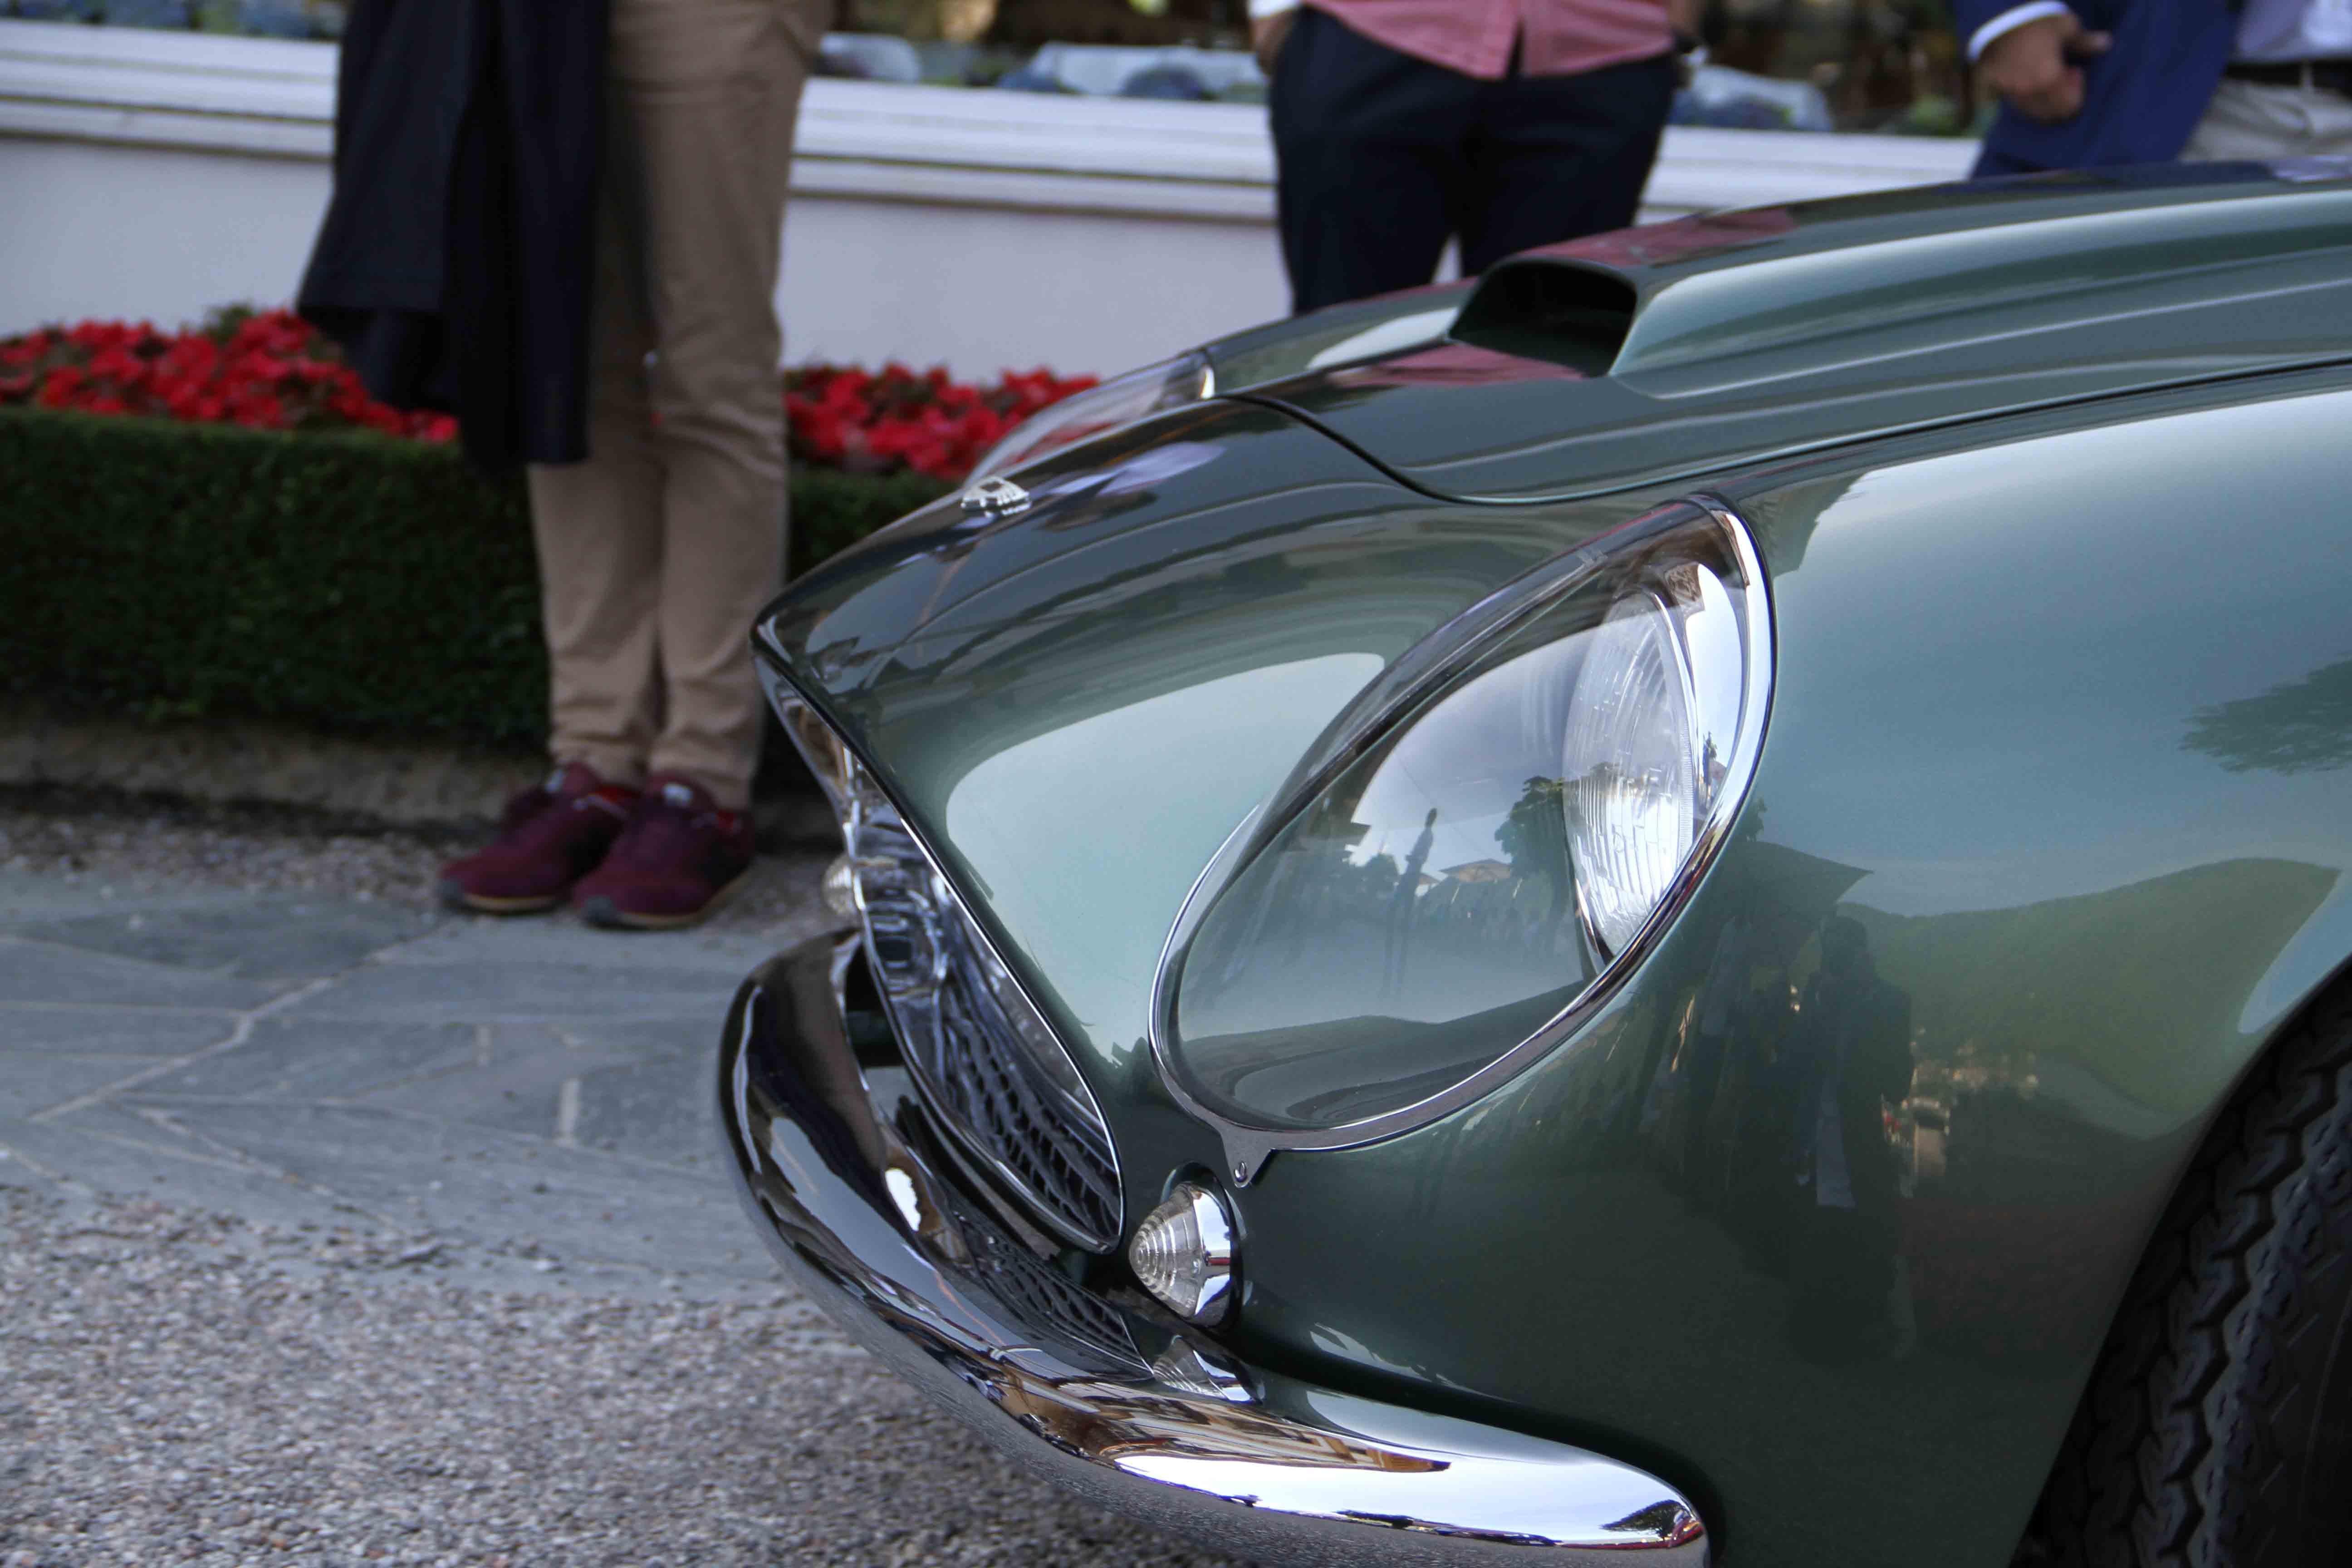 Aston Martin DB4 GT Zagato, 1961. Photo Report: Watch And Car Spotting At The 2016 Concorso d'Eleganza Villa d'Este With A. Lange & Söhne Photo Report: Watch And Car Spotting At The 2016 Concorso d'Eleganza Villa d'Este With A. Lange & Söhne IMG 5605